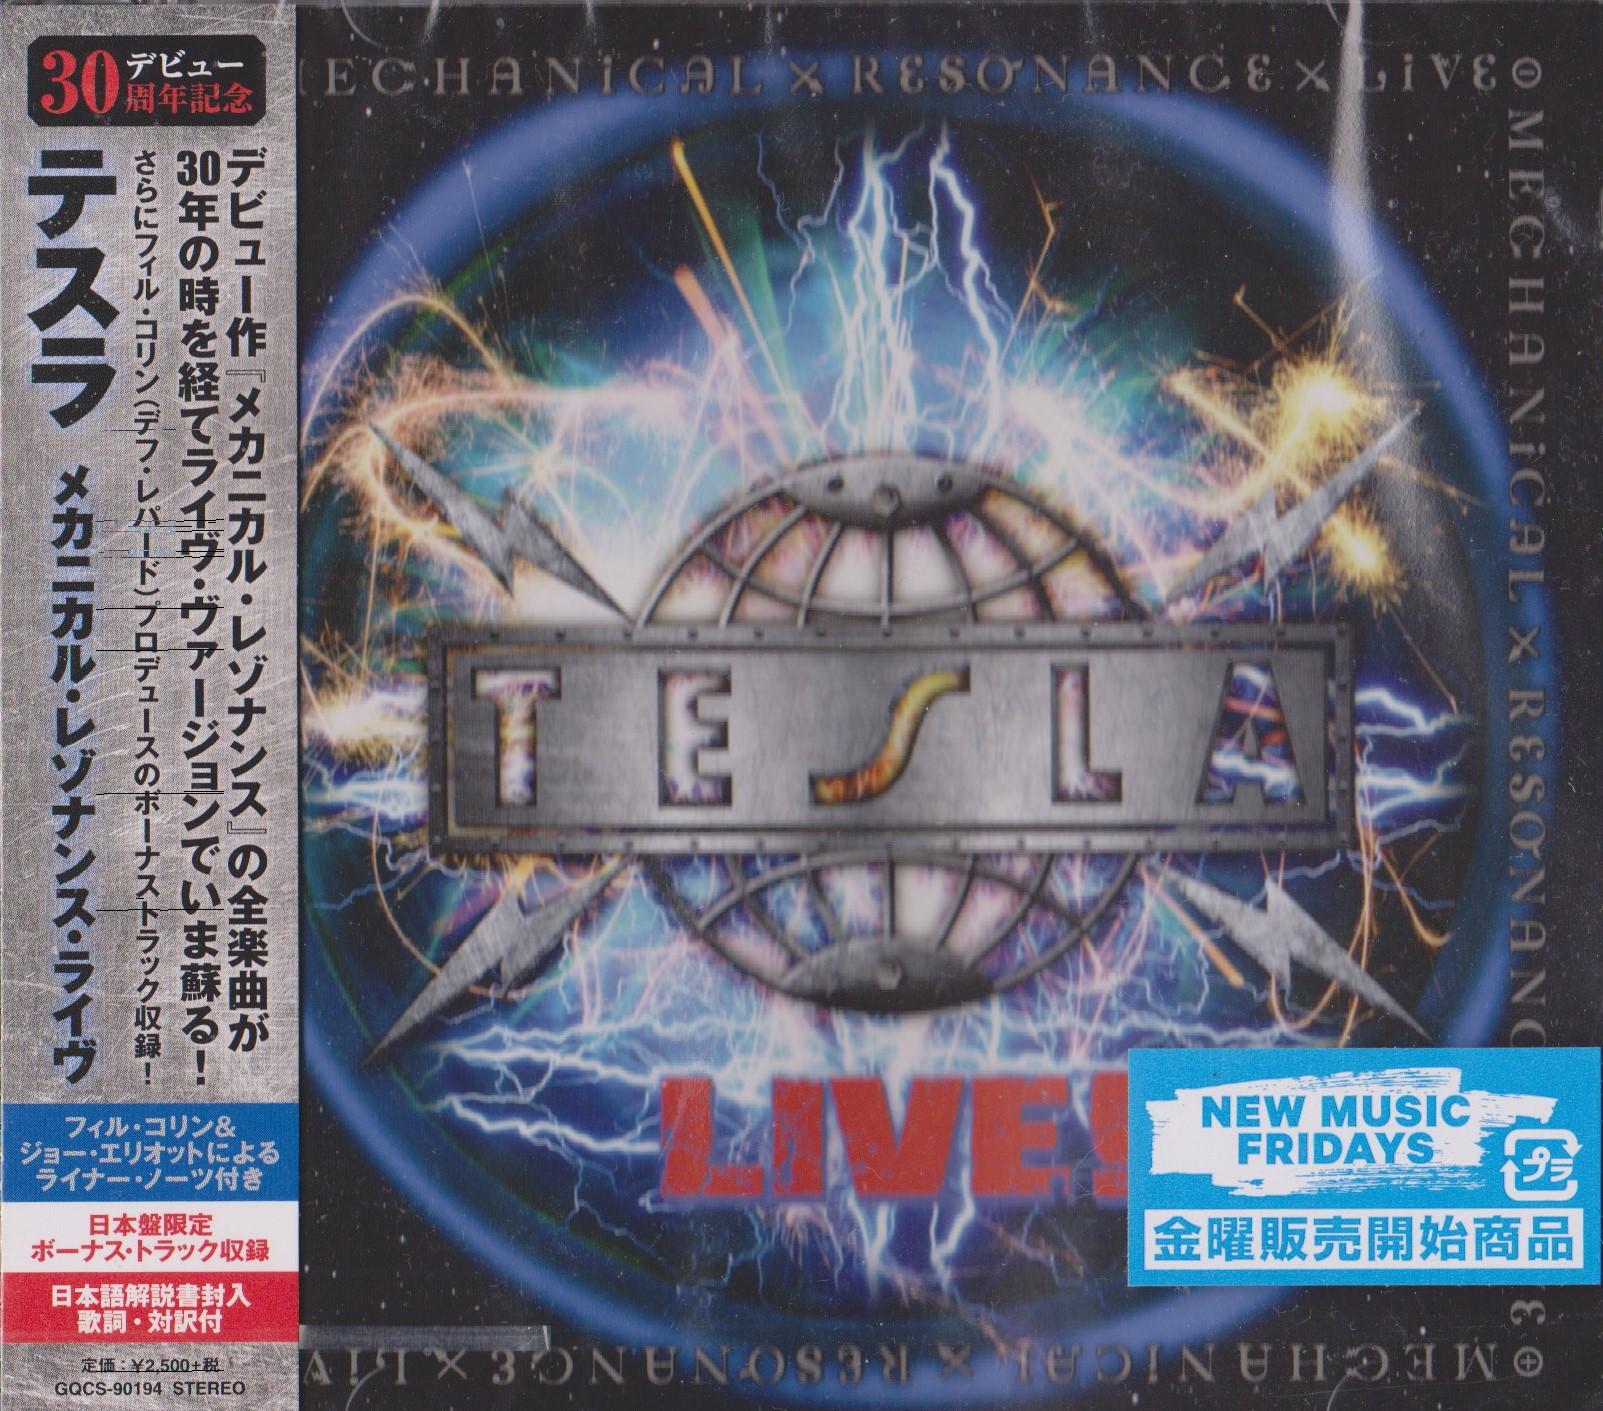 REVIEW: Tesla – Mechanical Resonance Live! (2016 Japanese with bonus